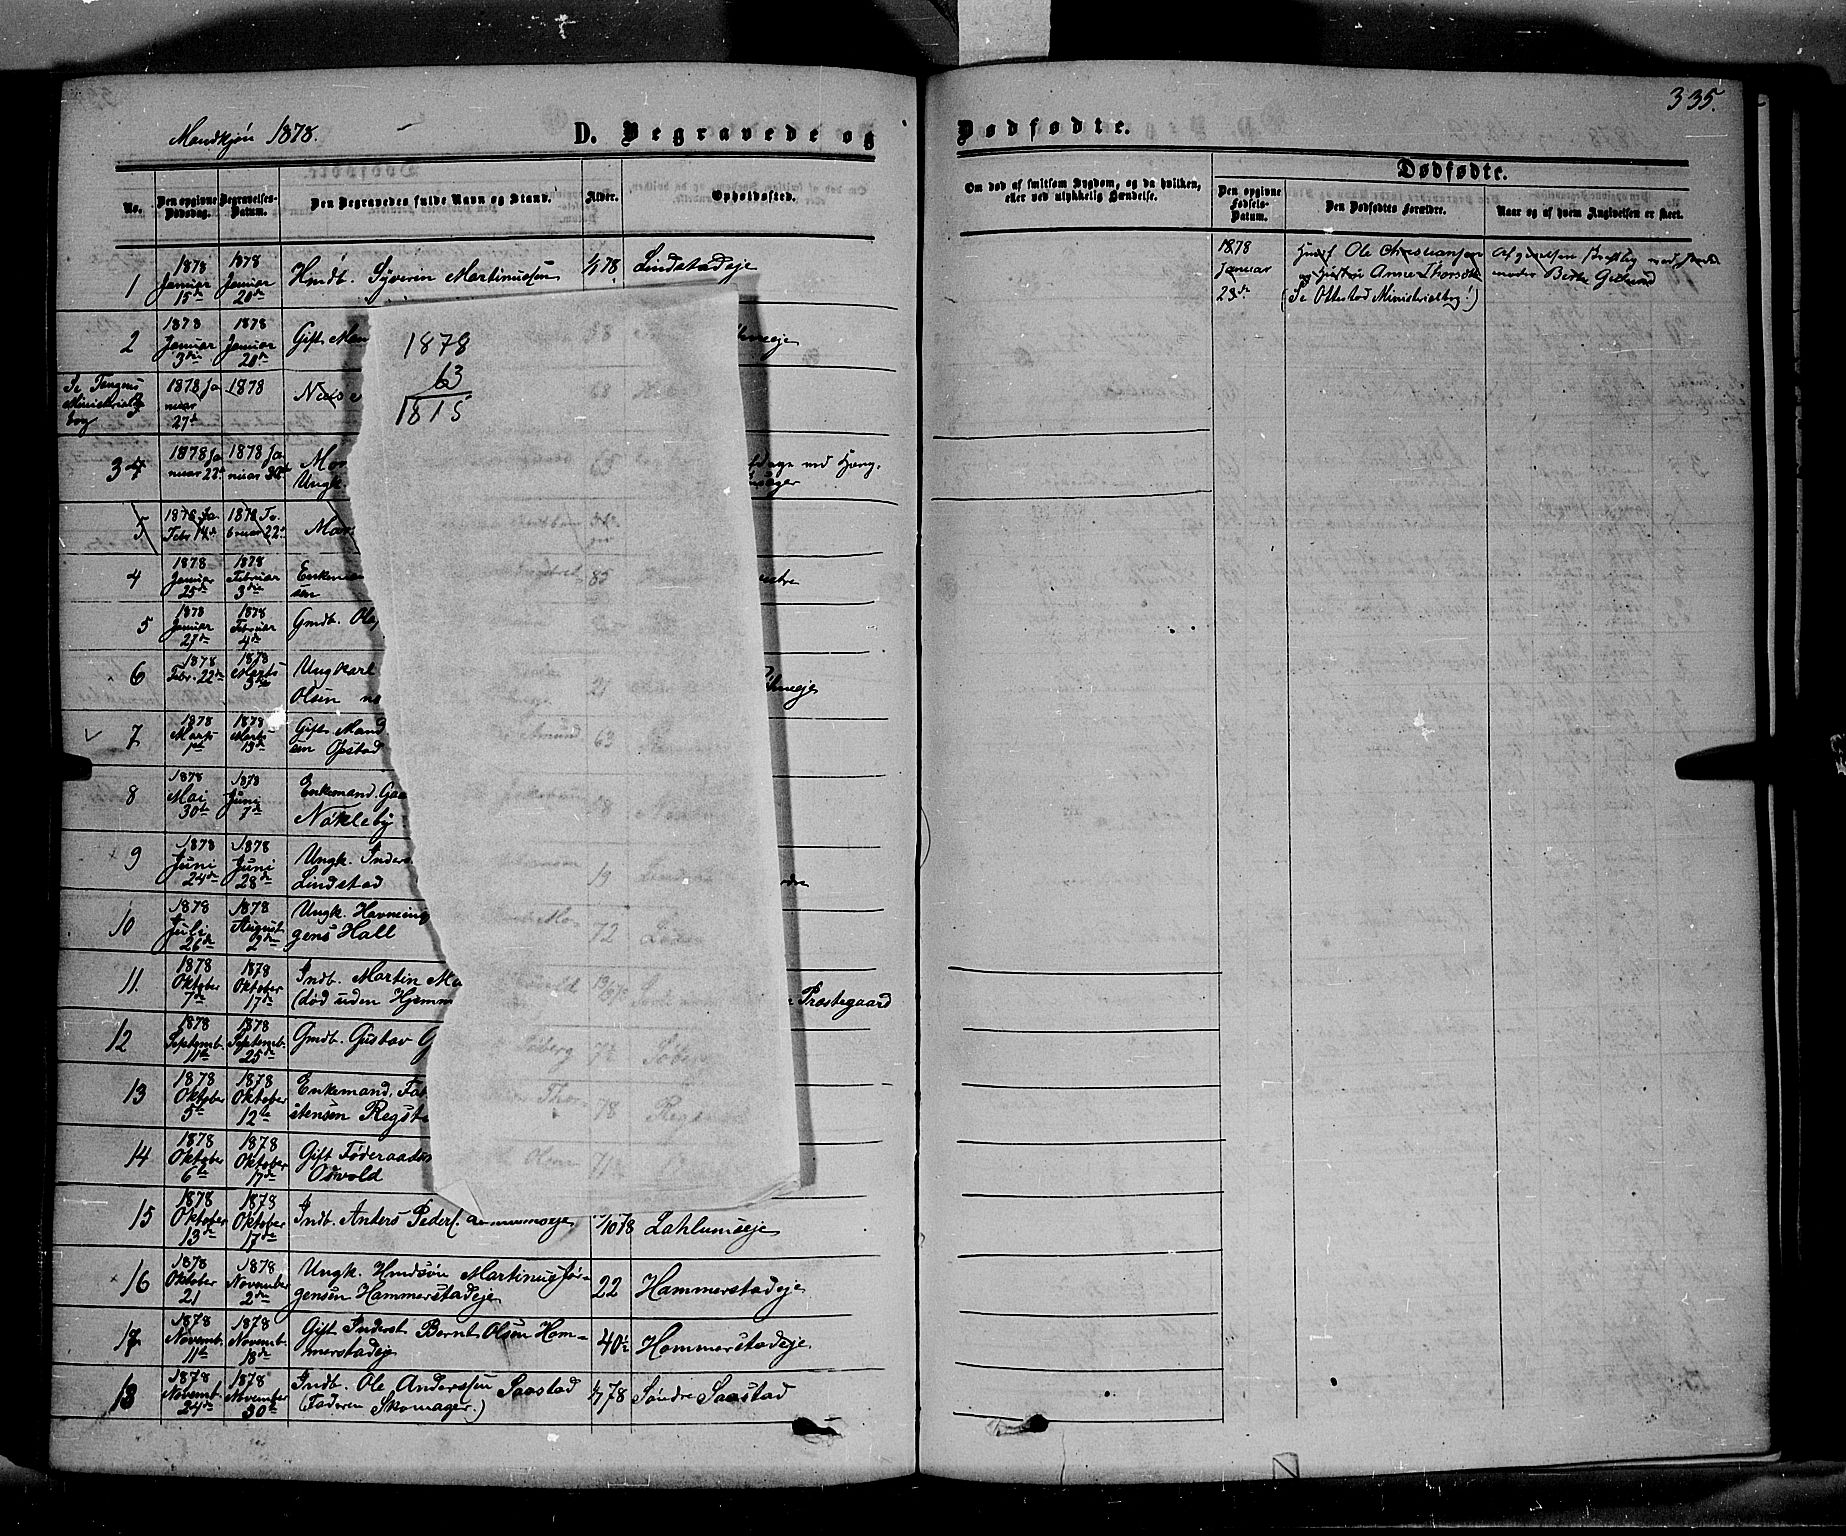 SAH, Stange prestekontor, K/L0013: Ministerialbok nr. 13, 1862-1879